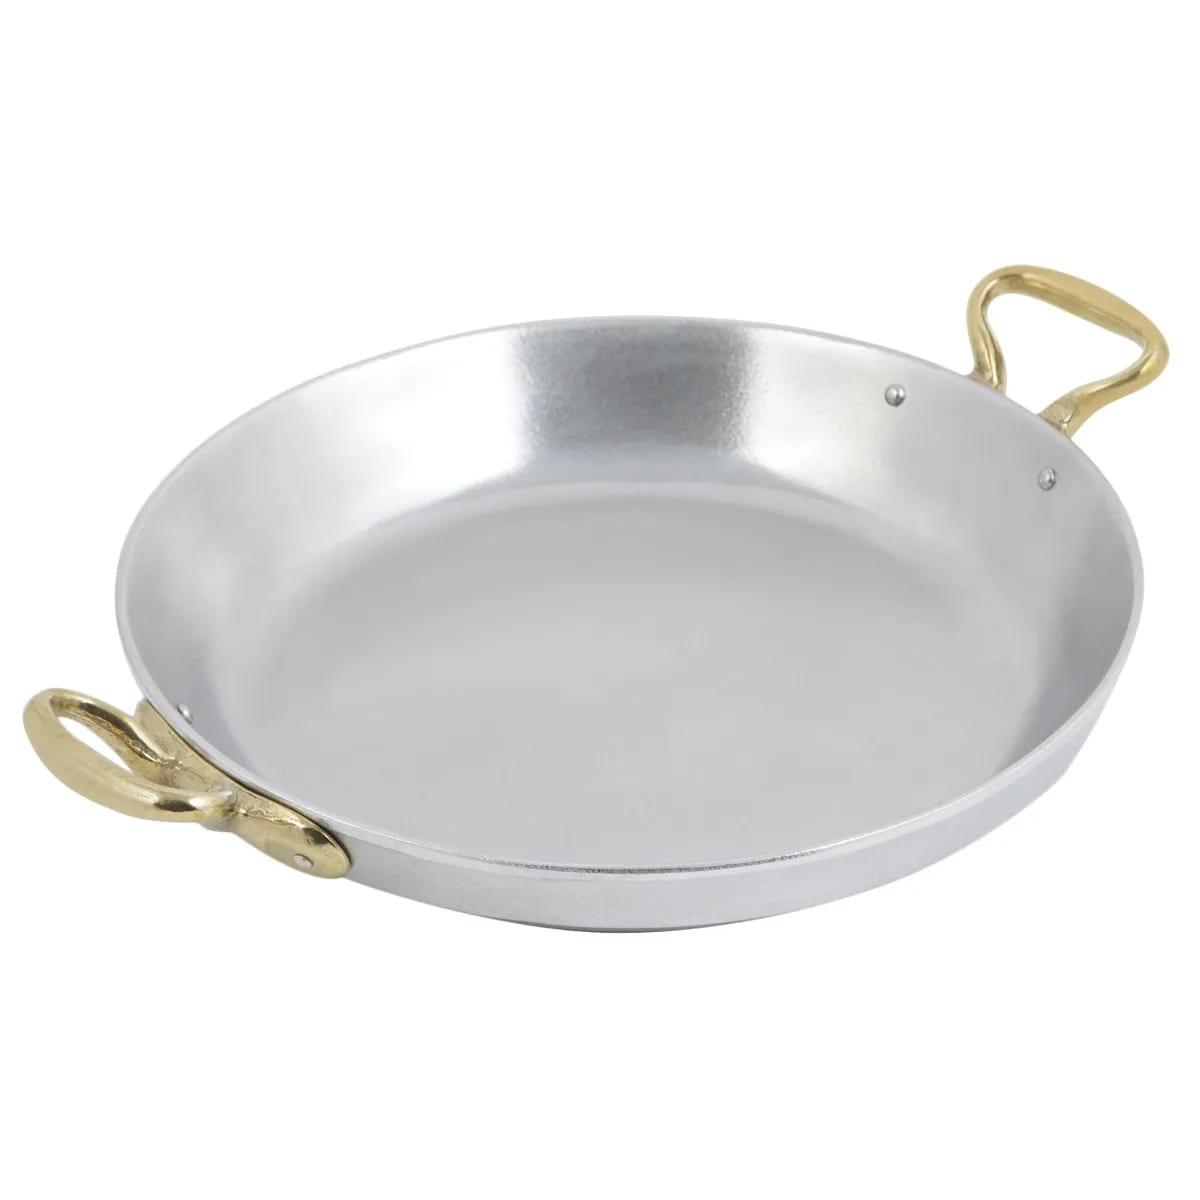 "Bon Chef 5100P 12"" Aluminum Paella Pan w/ 2 qt 20 oz Capacity, Pewter"